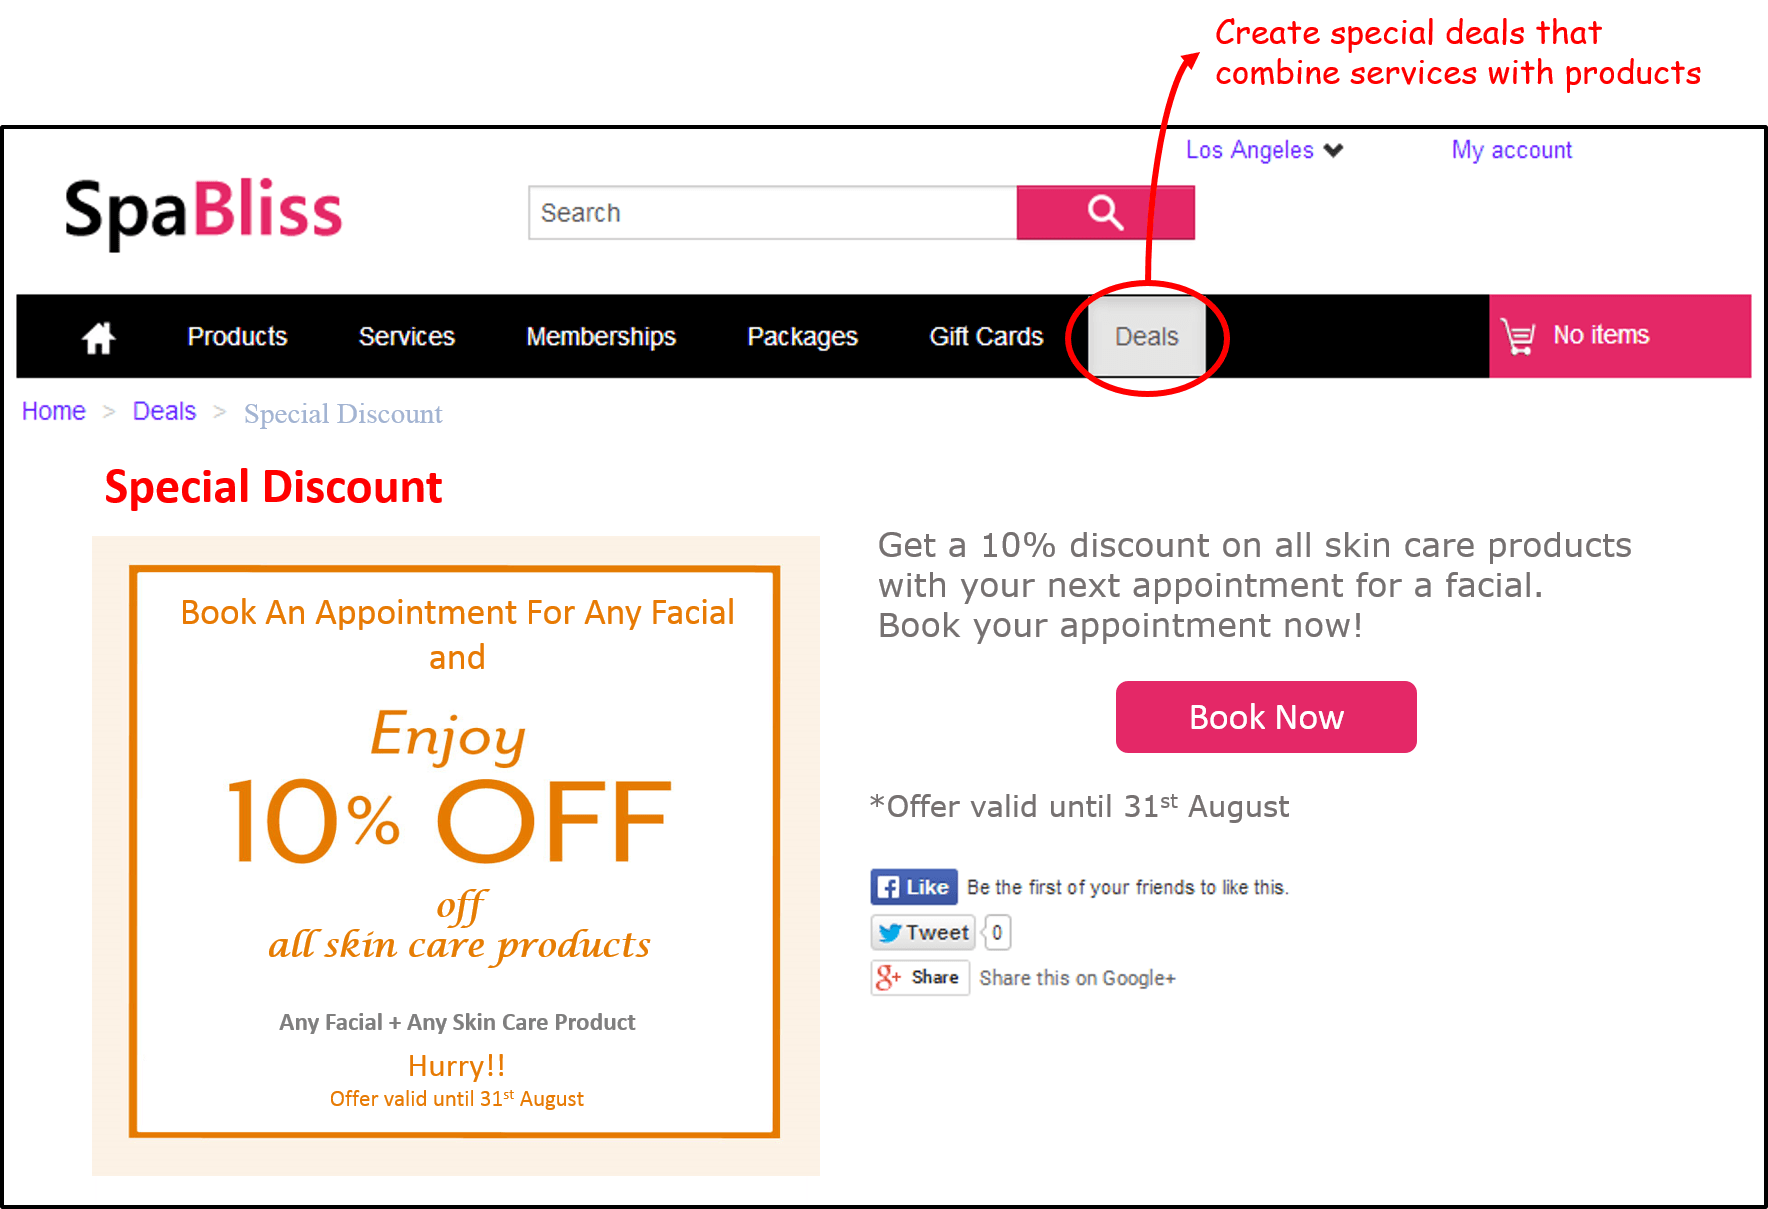 Product + Service Deals